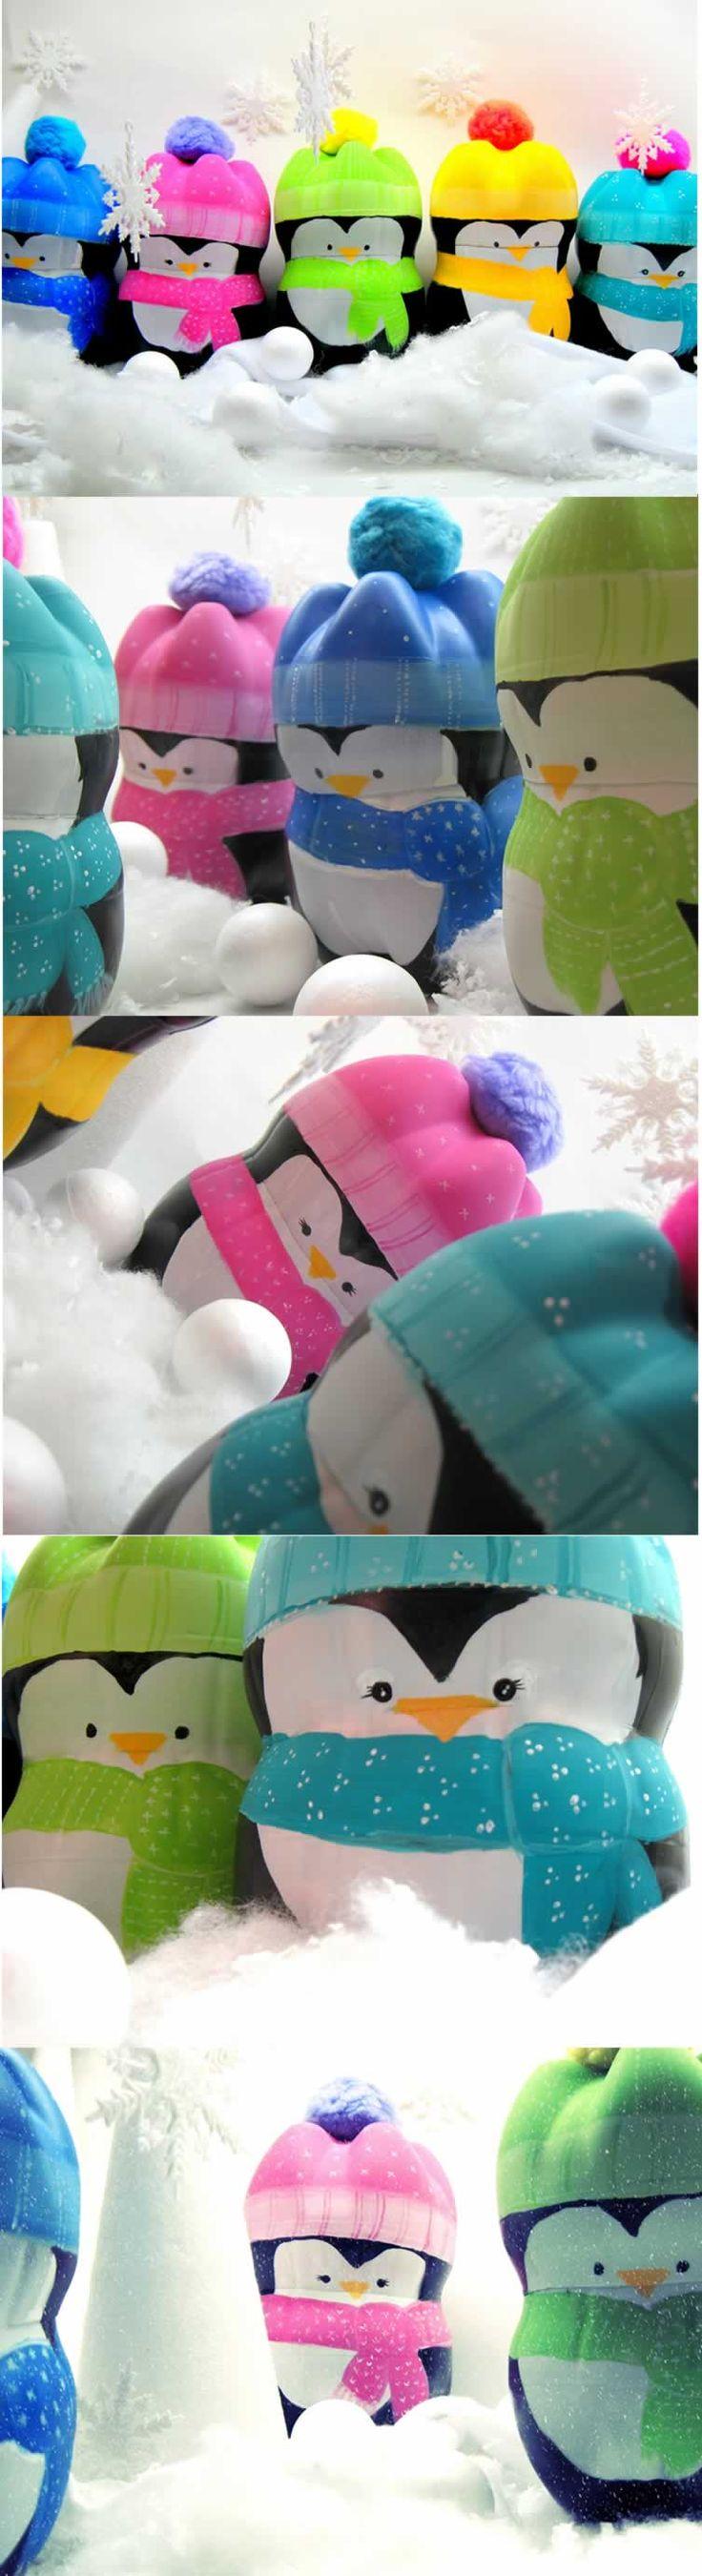 Pinguinos hechos con botellas plásticas Pinguins de garrafa PET enfeites de natal